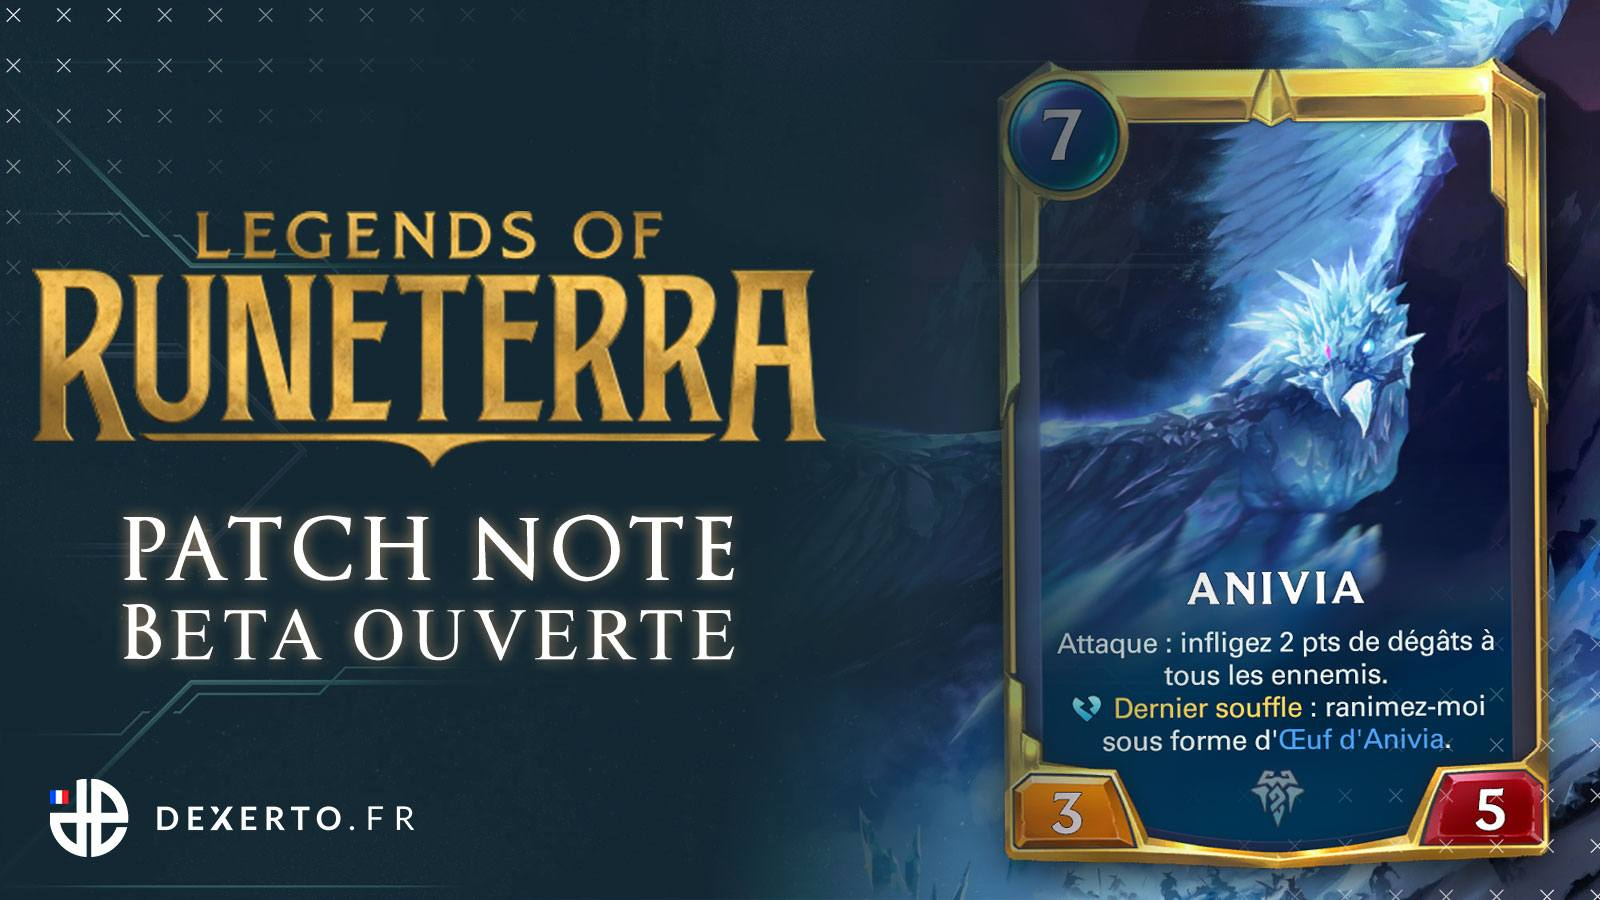 Patch note de Legends of Runeterra